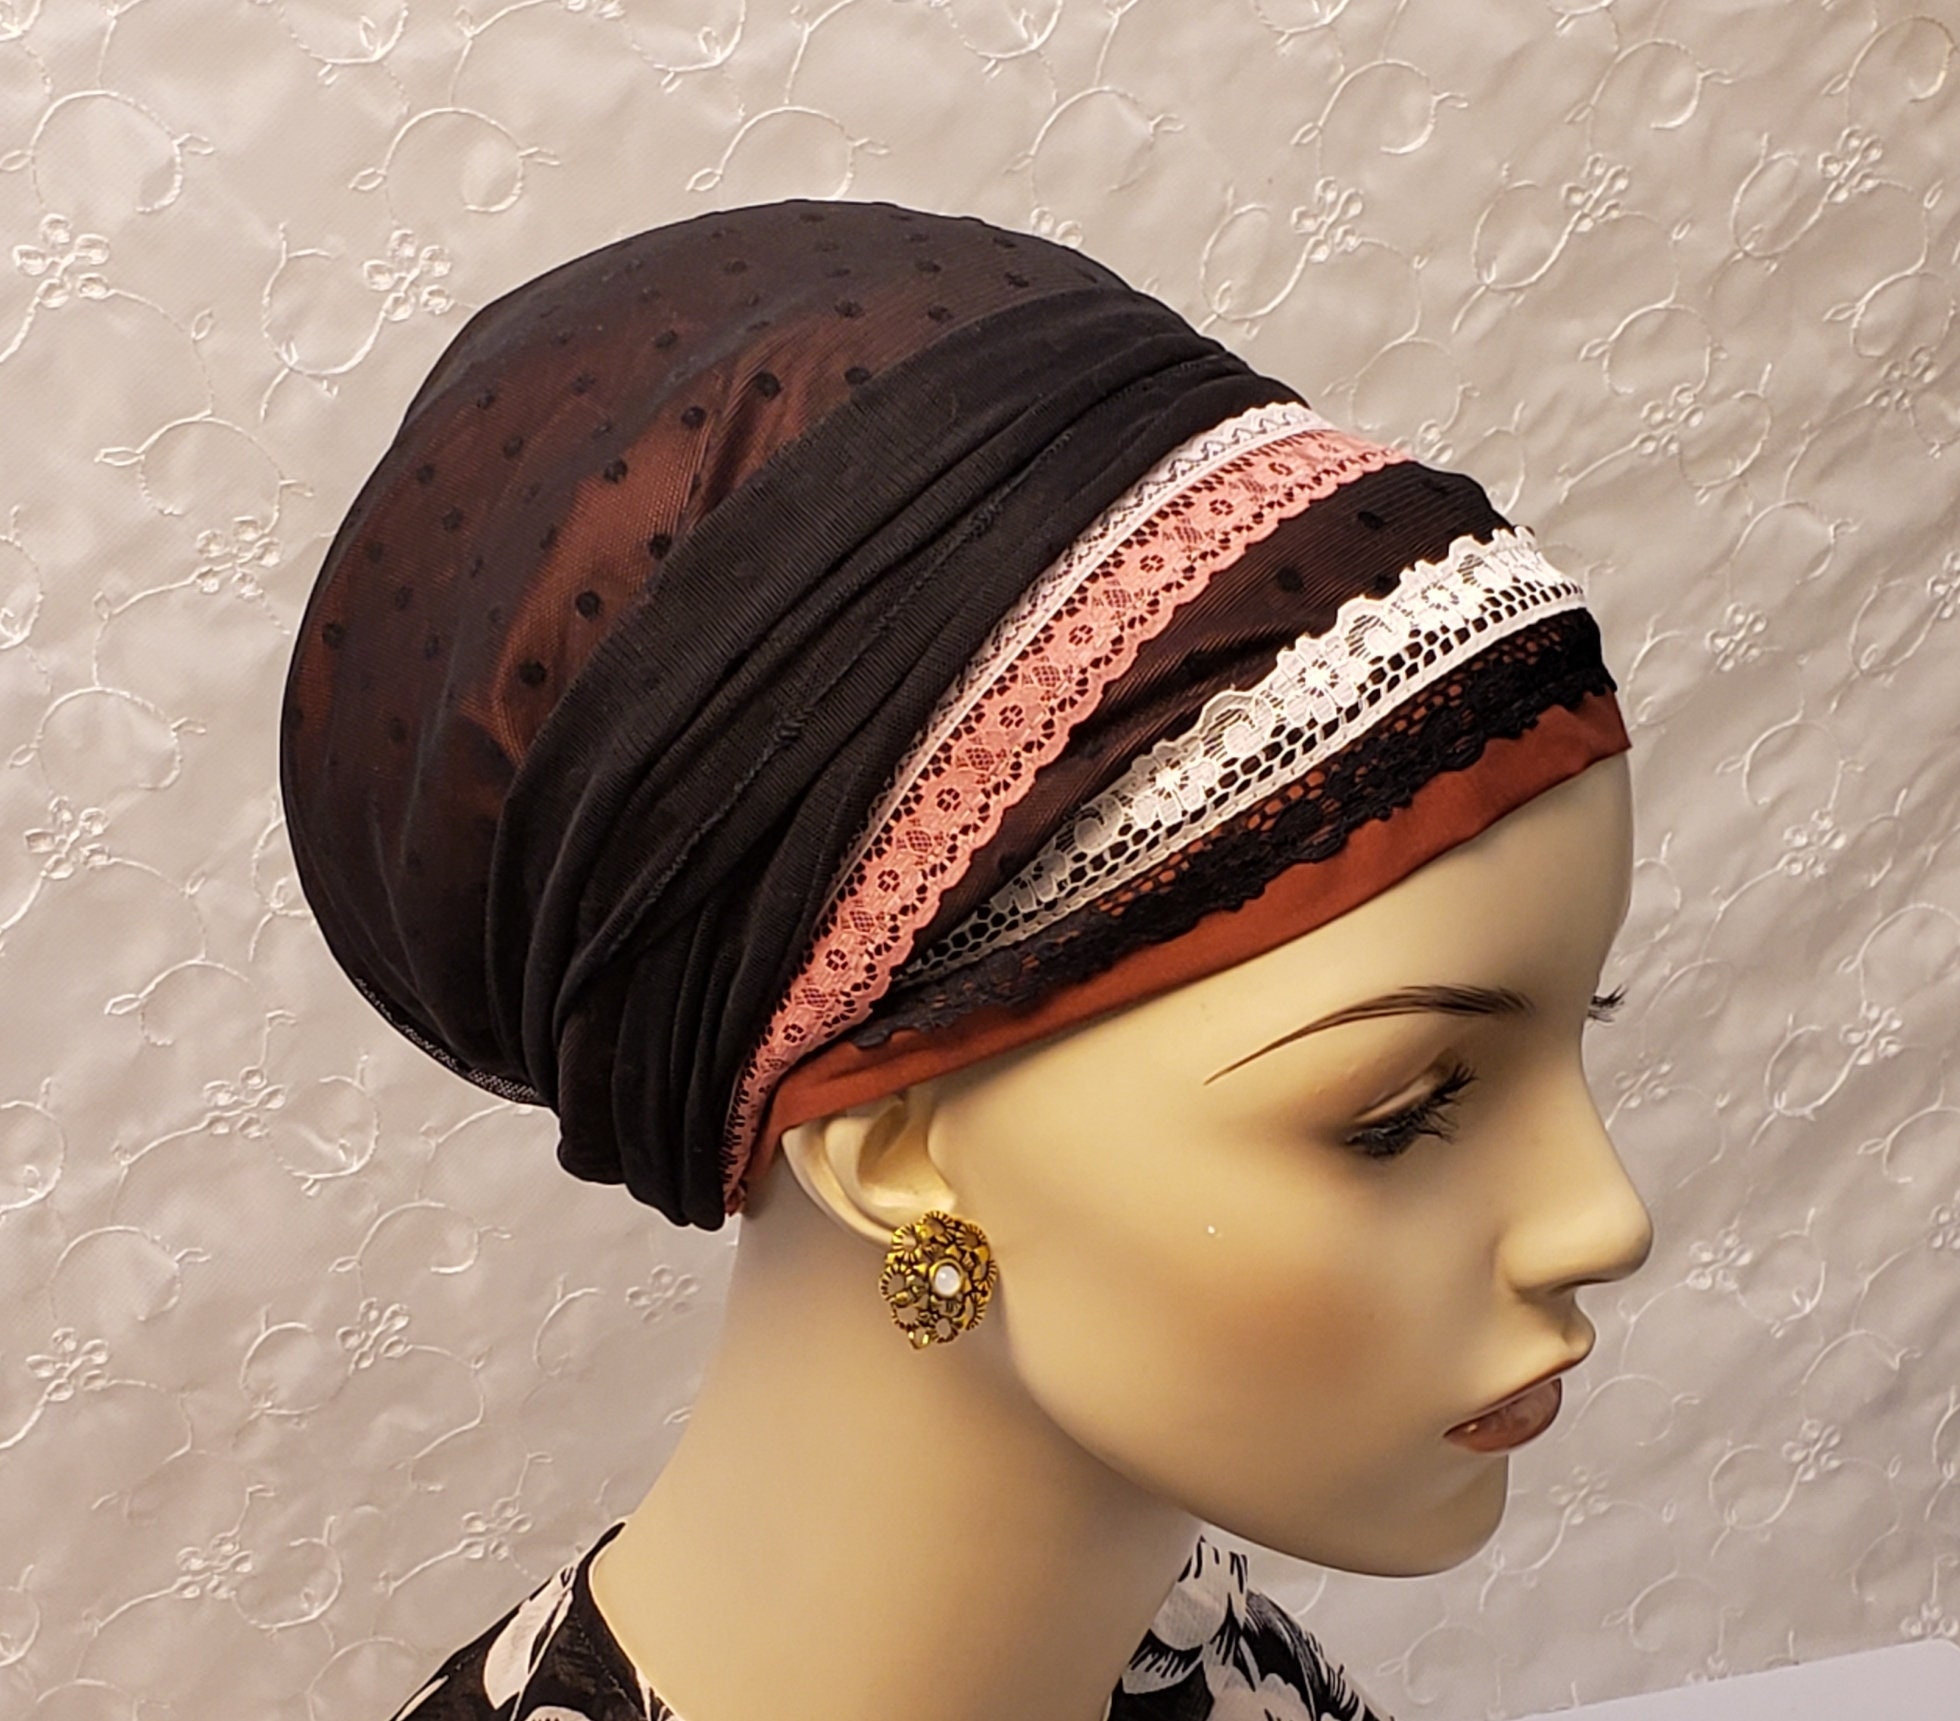 Hair Accessories Modest Knit Headwrap Black Baby Accessories